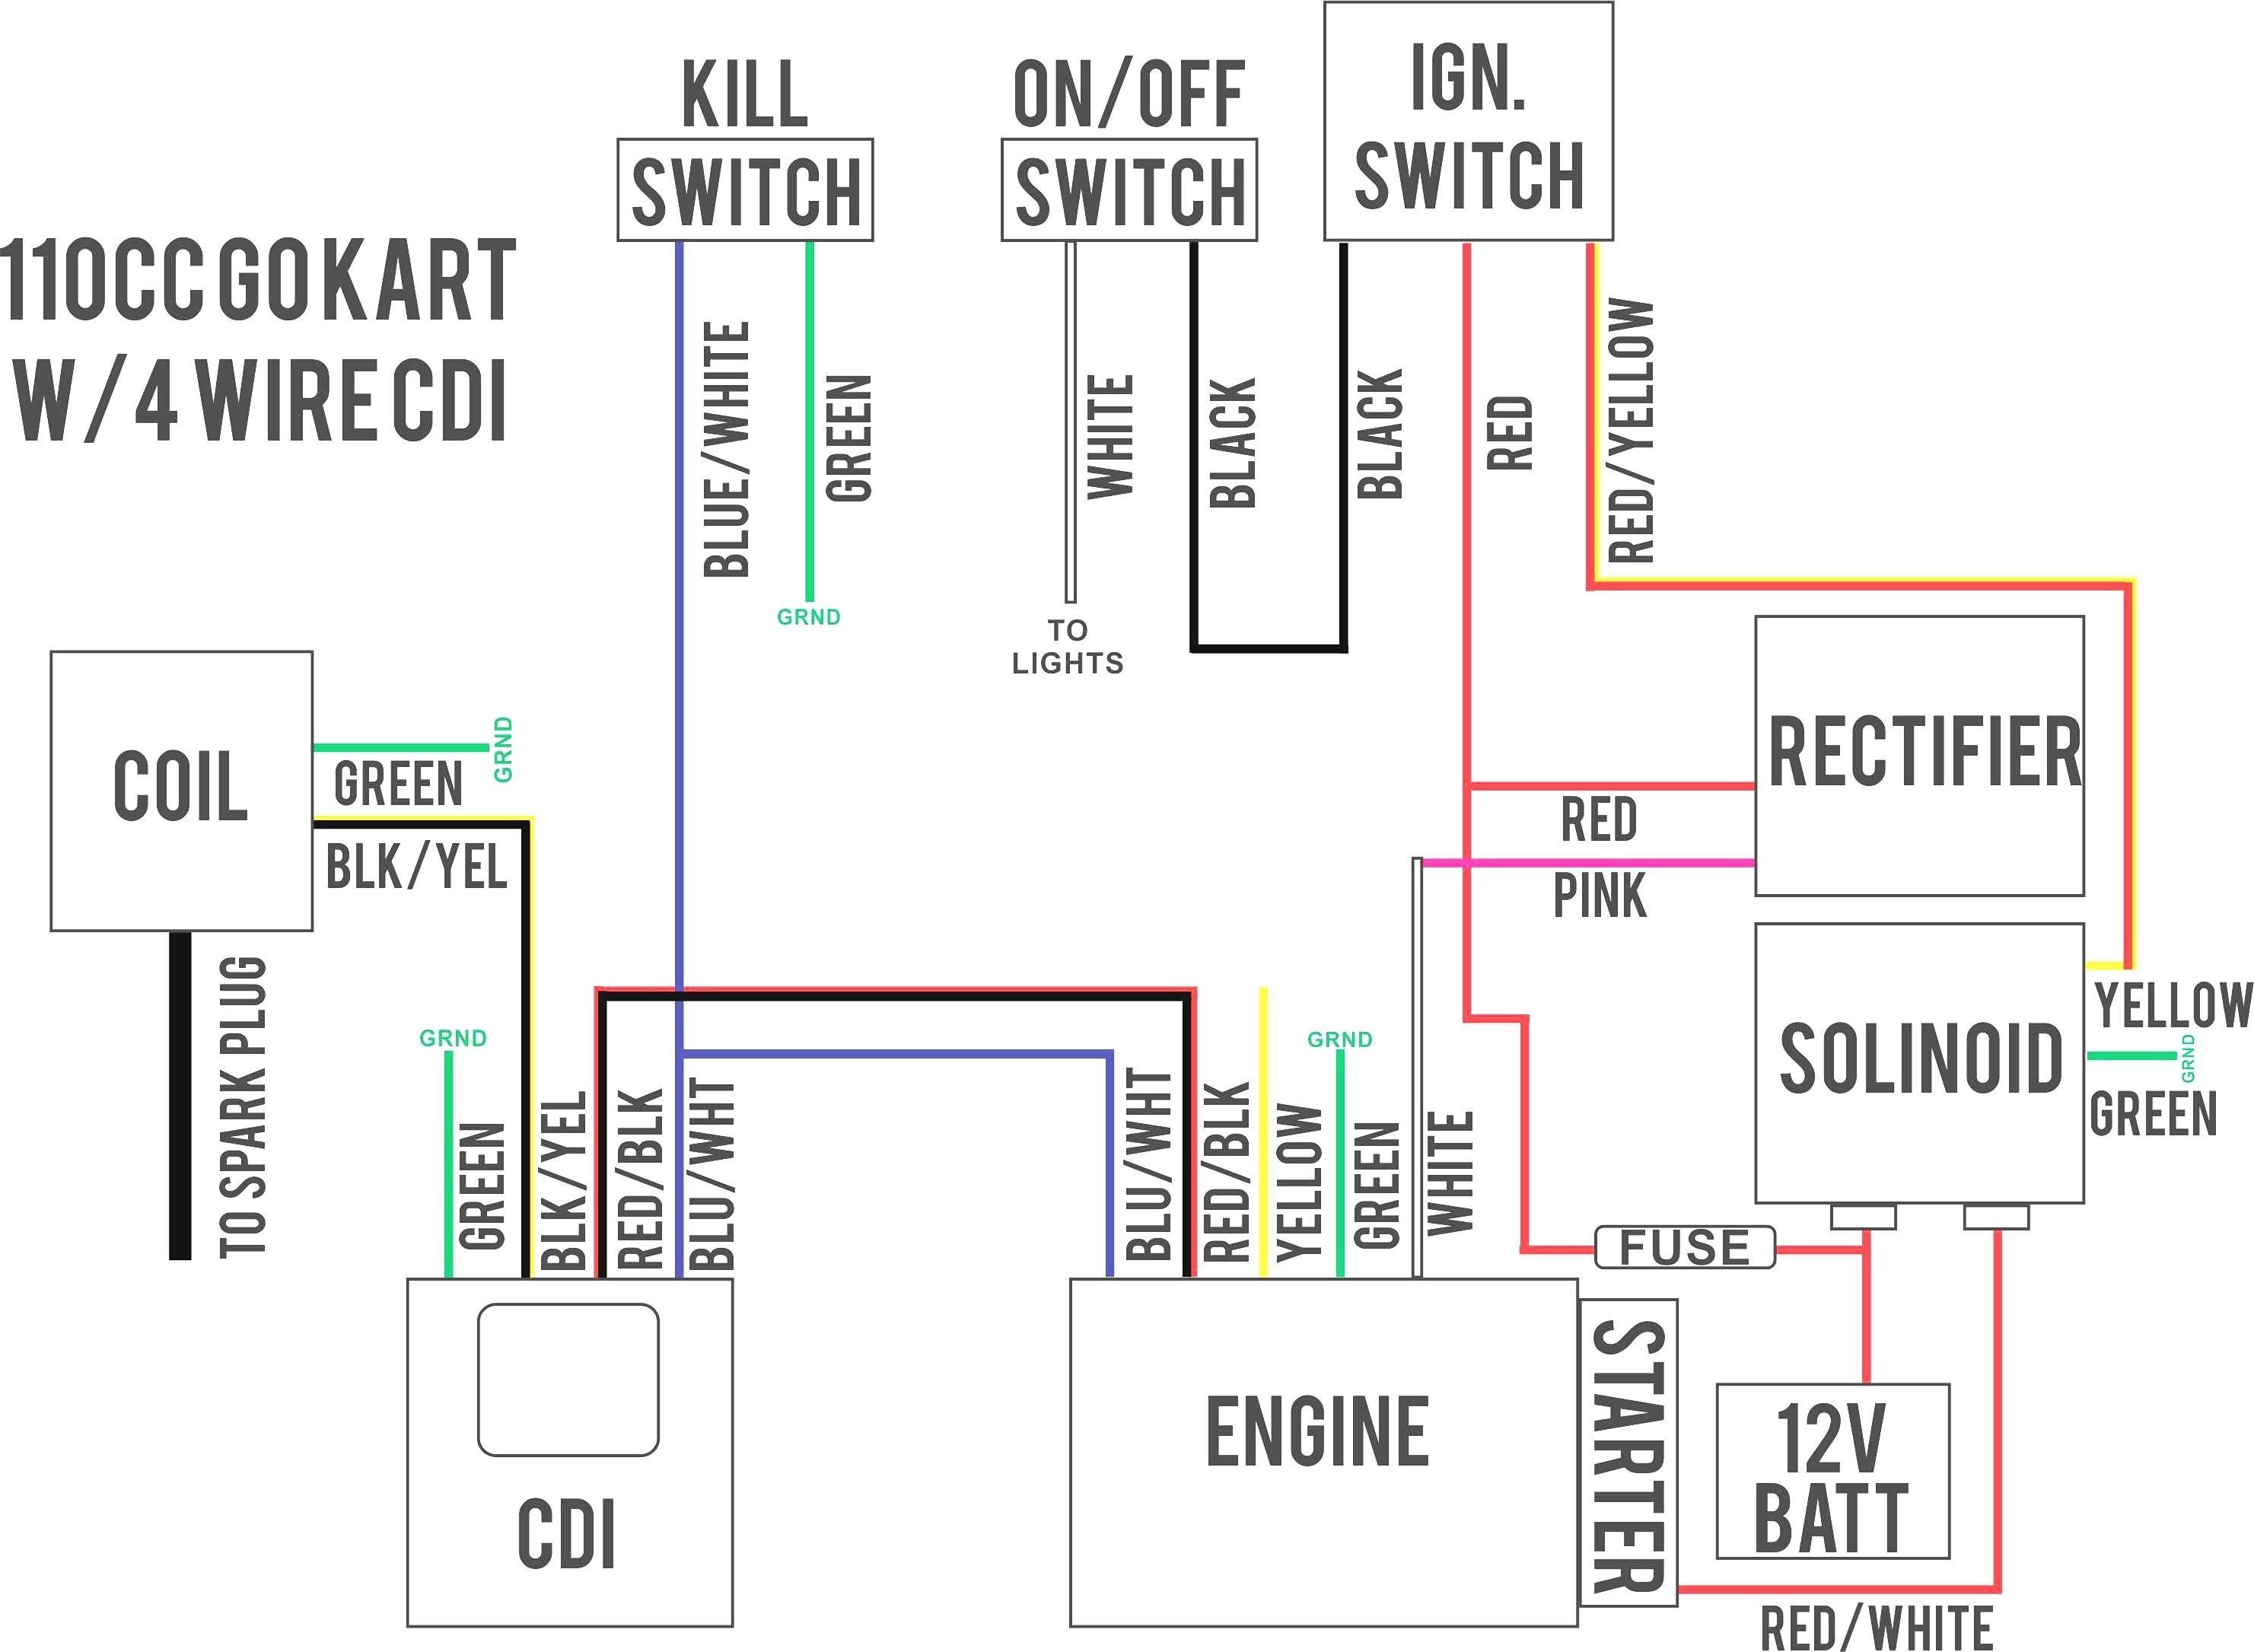 Car Alarm Circuit Diagram Best Wiring Diagram Alarm System Car Of Car Alarm Circuit Diagram